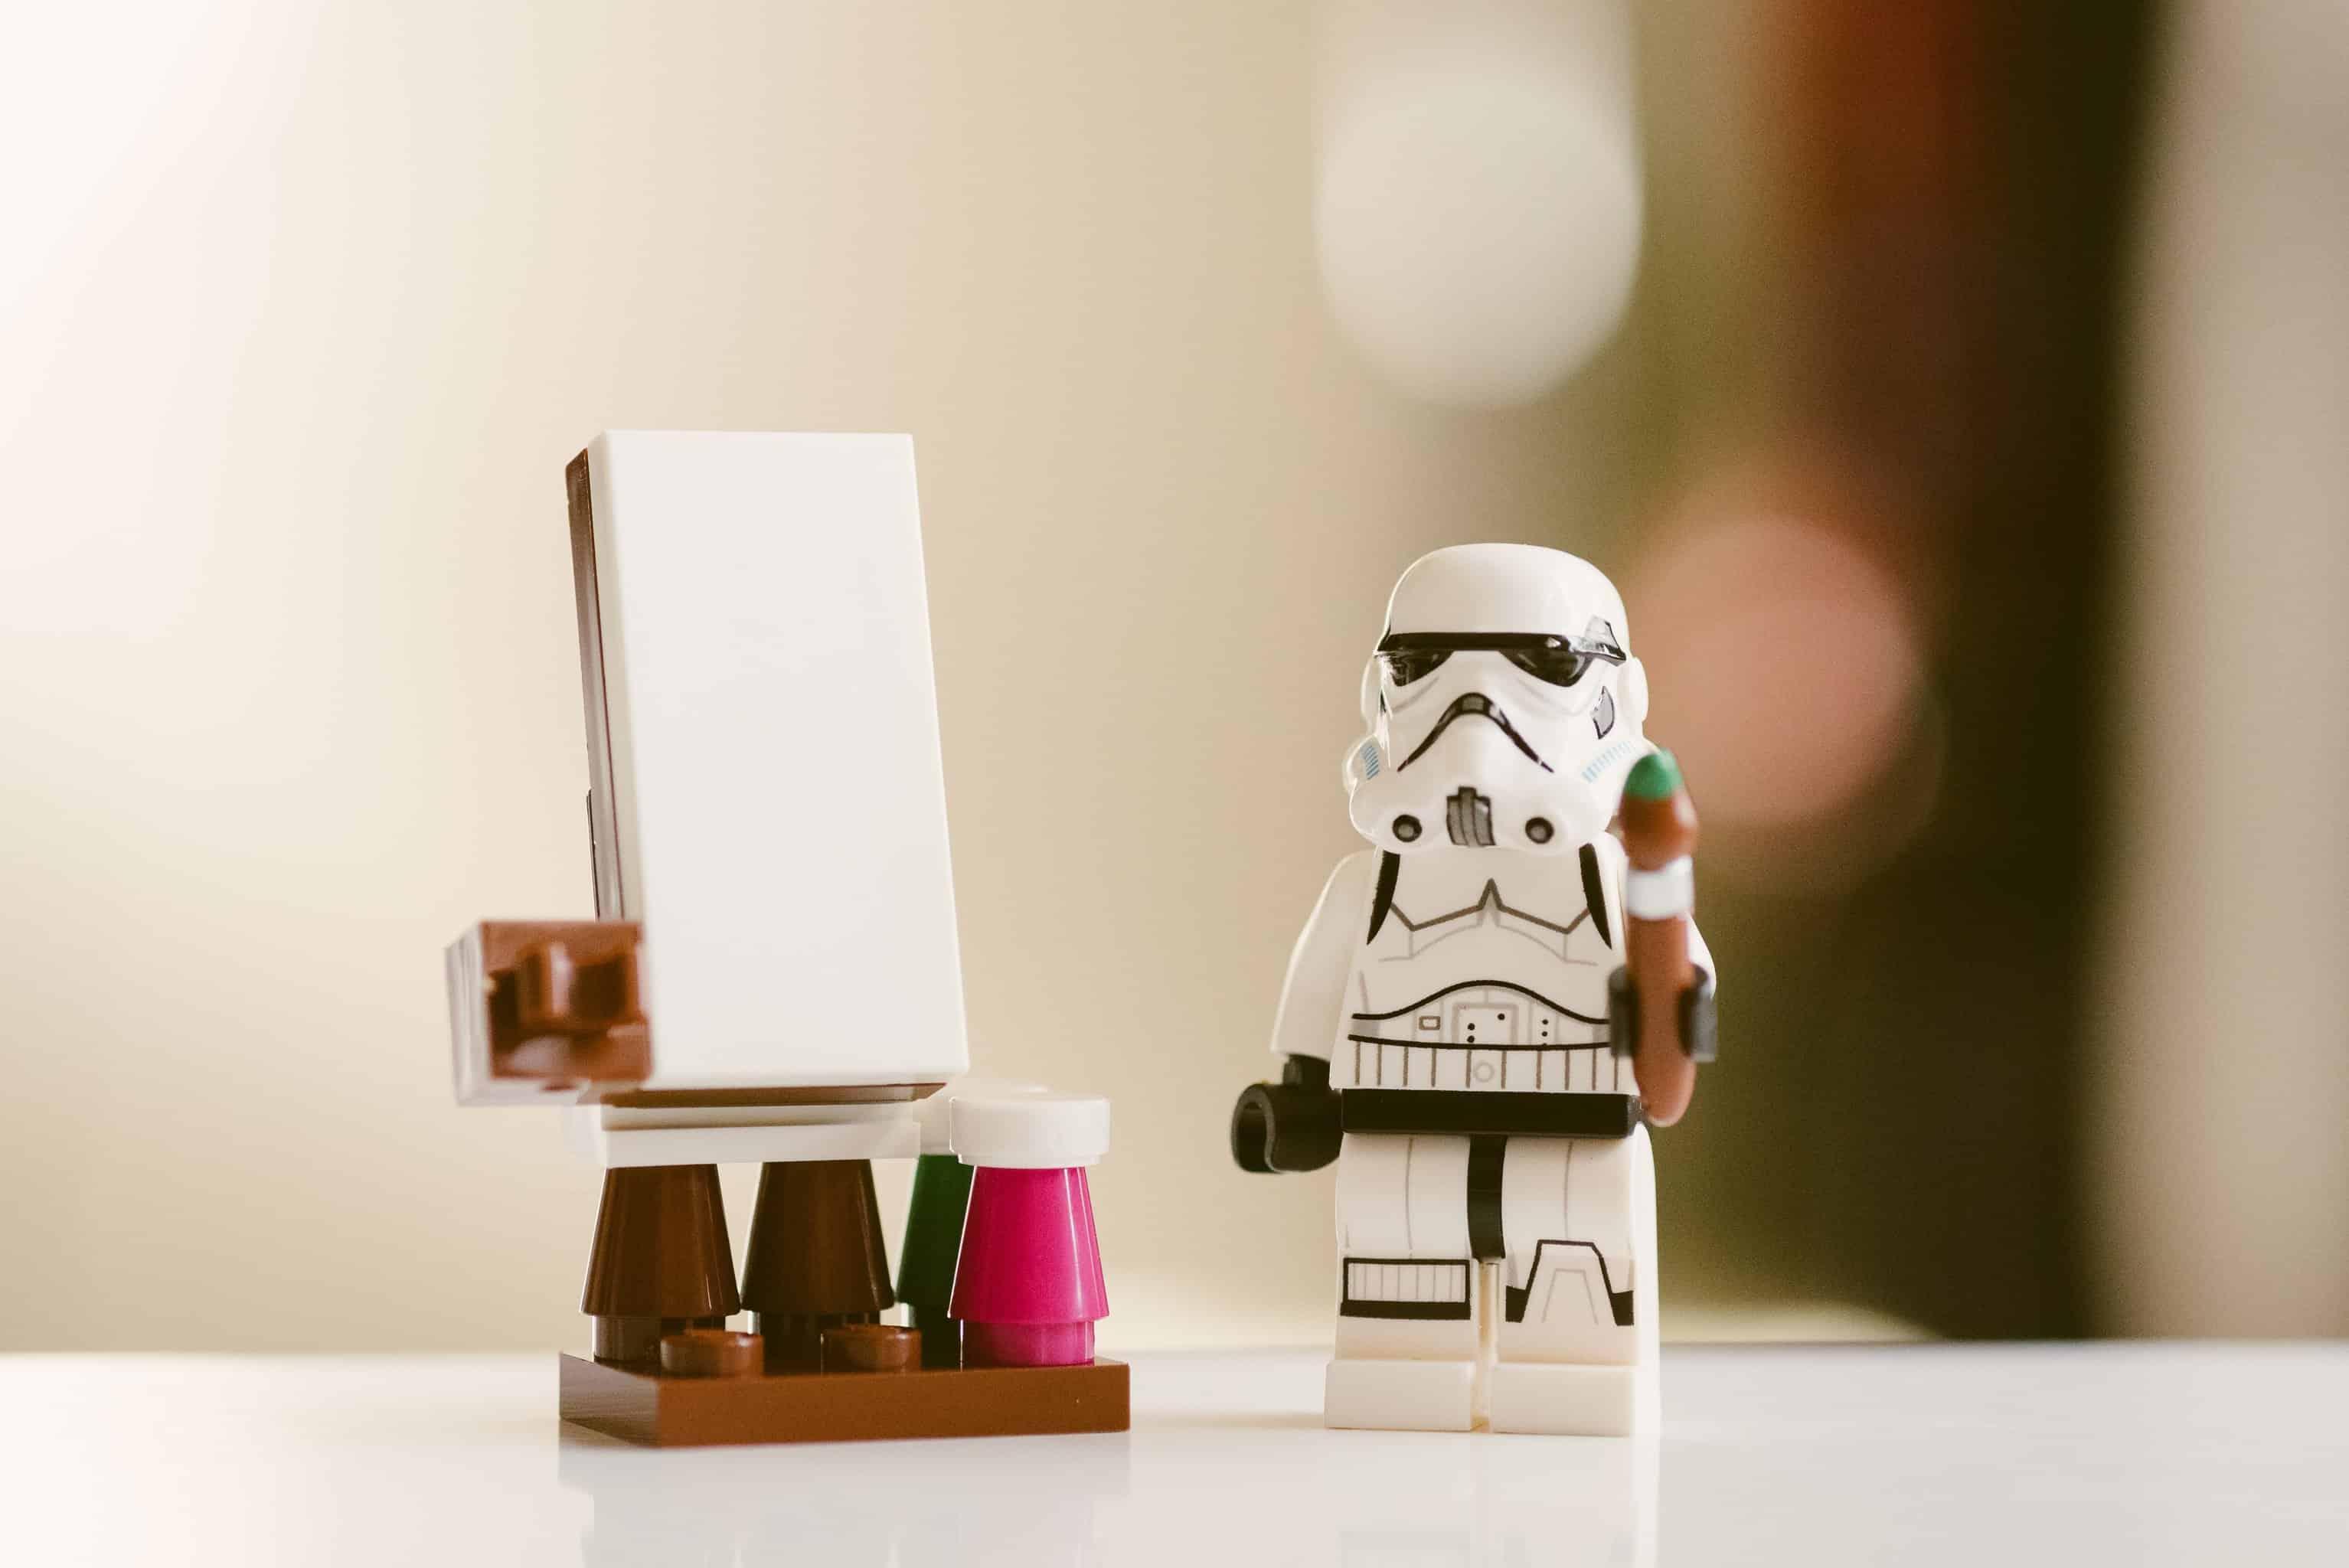 a stormtrooper mini figure